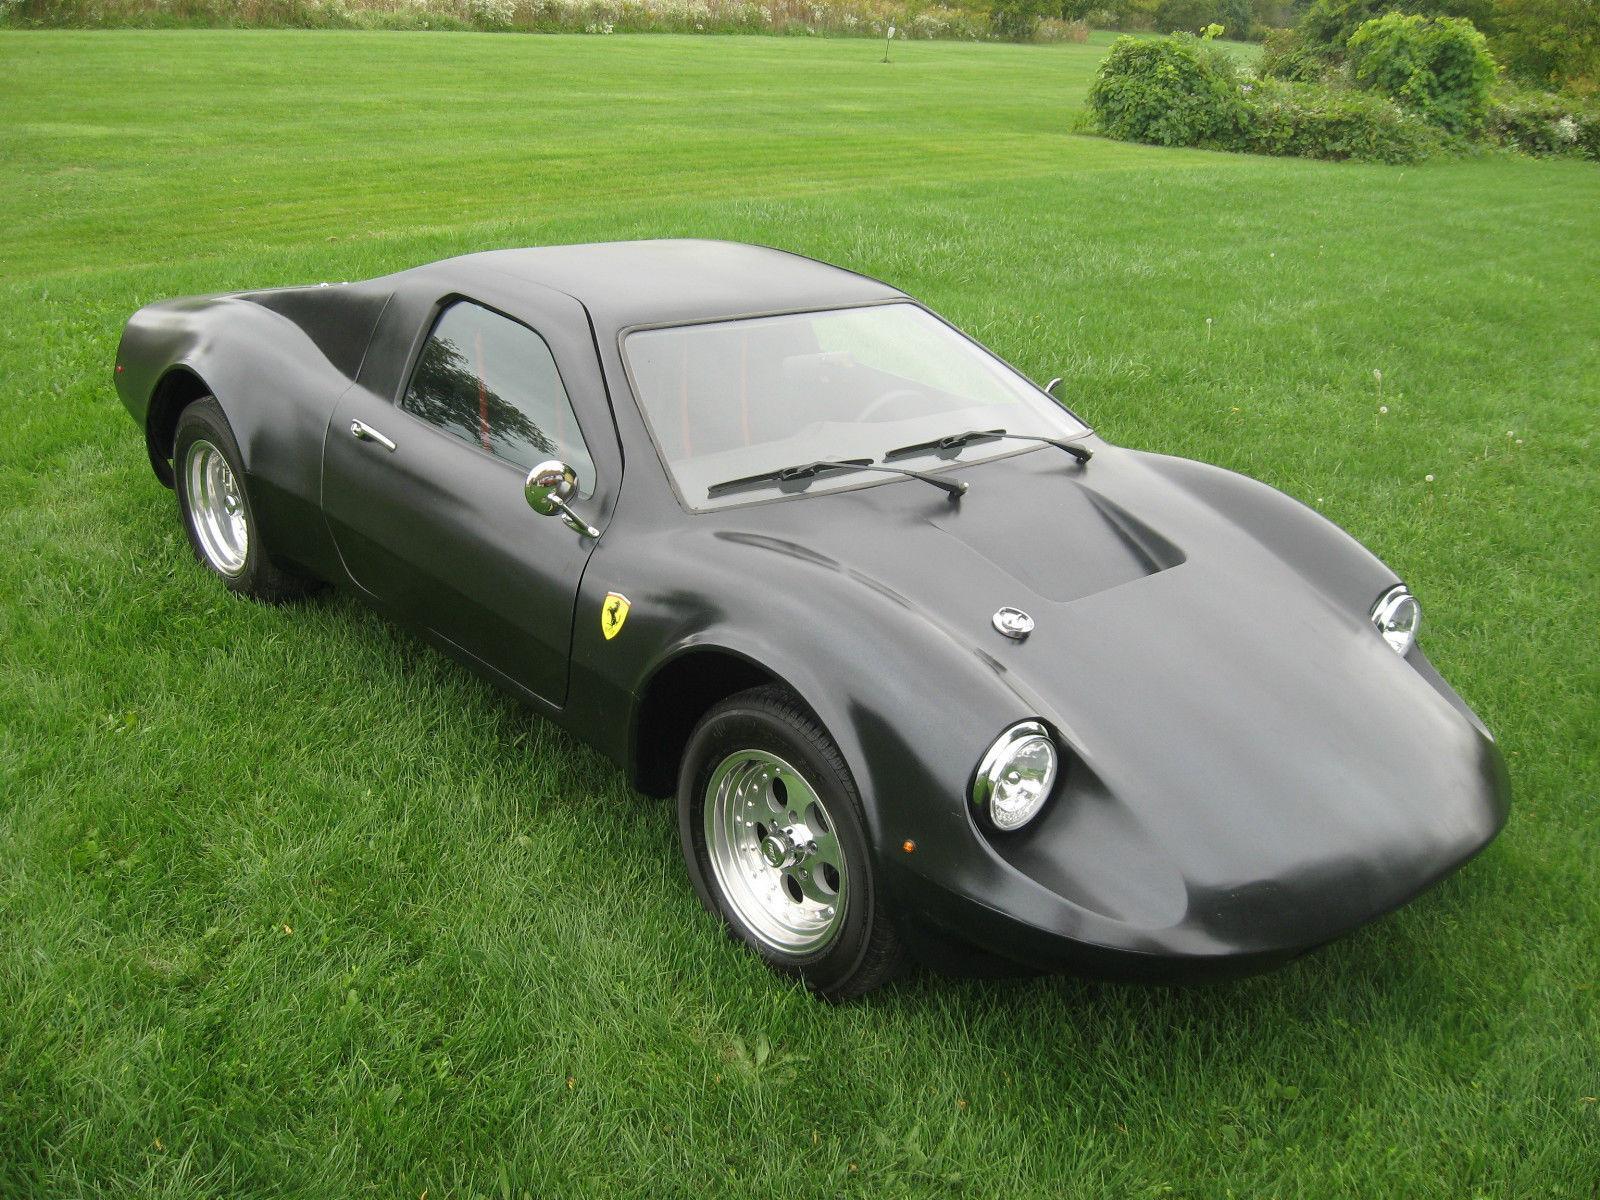 Ferrari Cars For Sale >> 1974 Ferrari 246 GT for sale